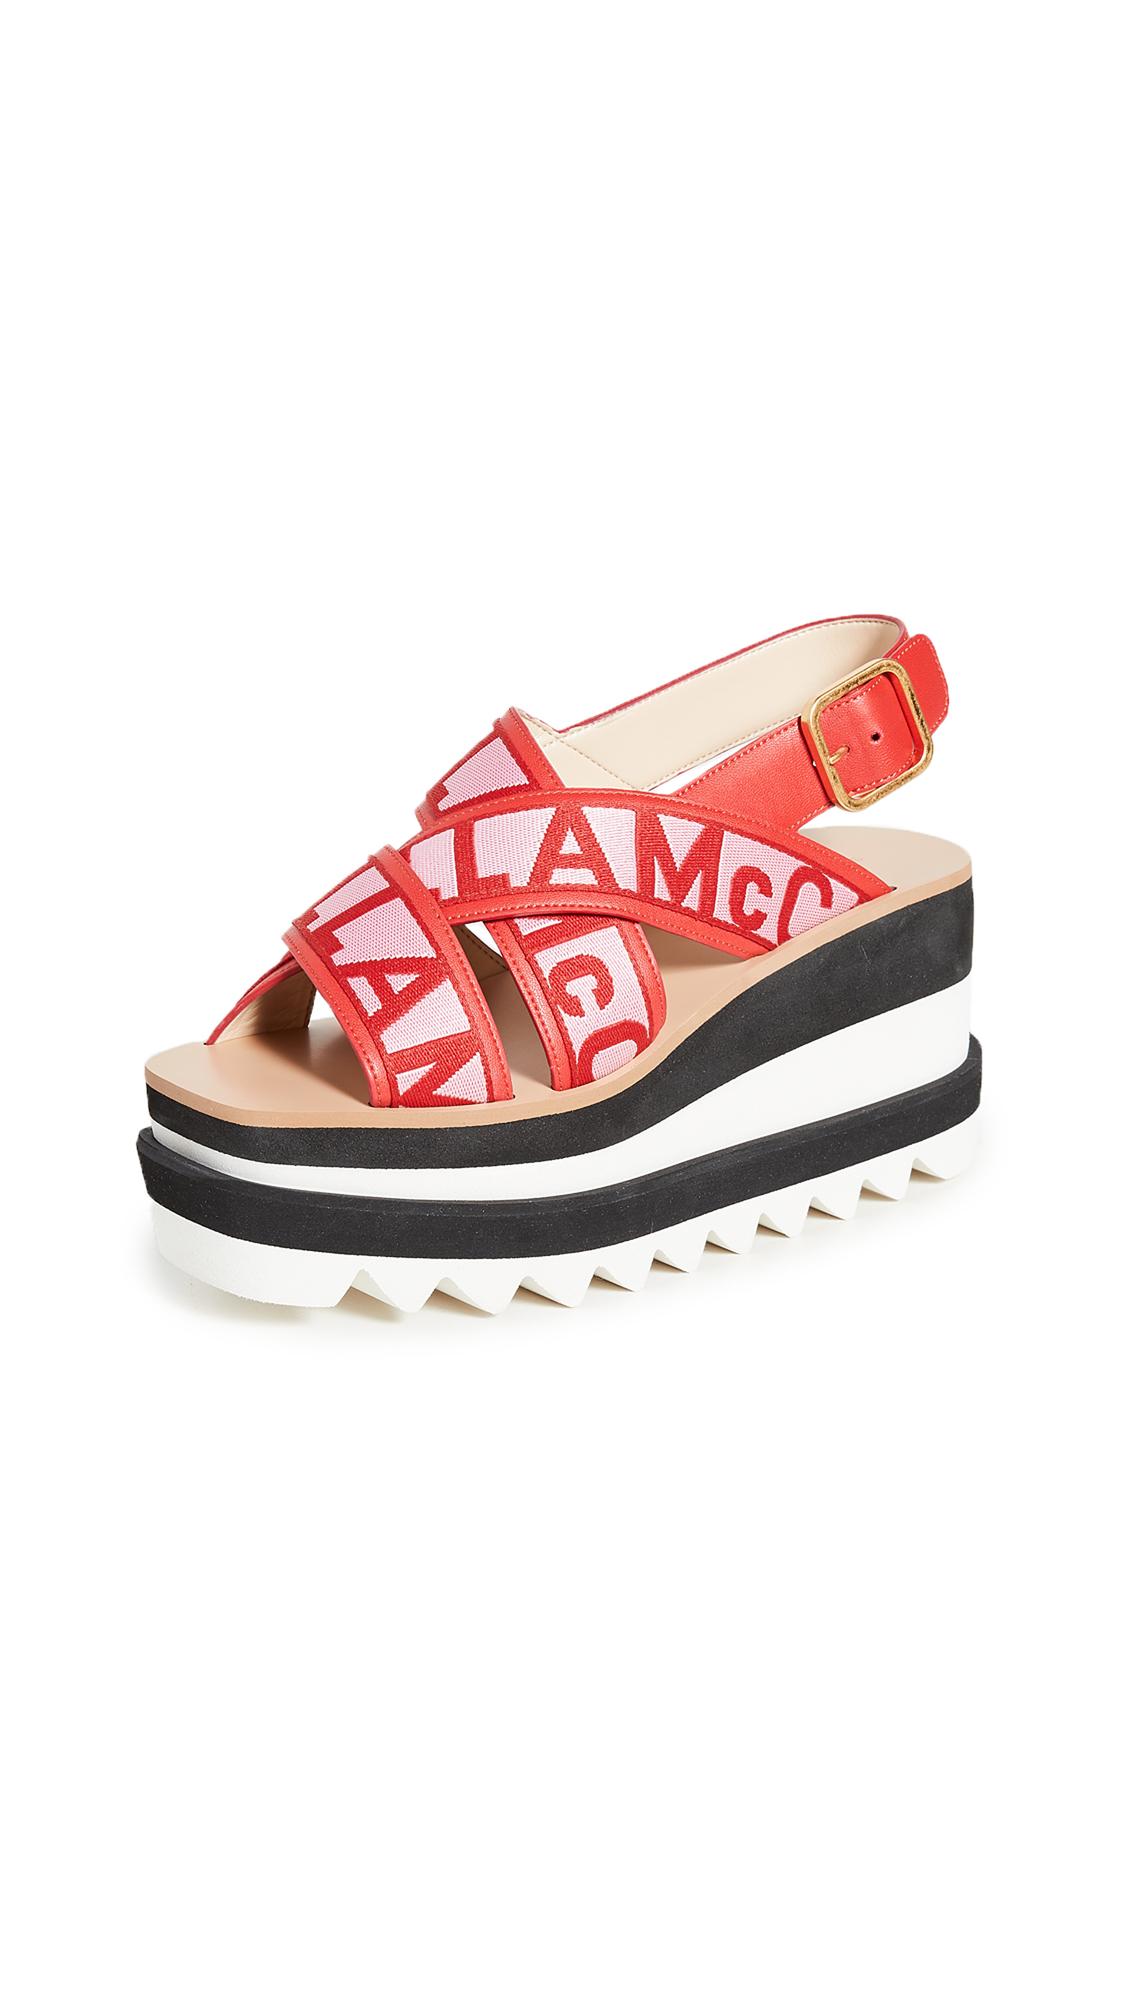 Stella McCartney Sneak Elyse Sandals – 40% Off Sale